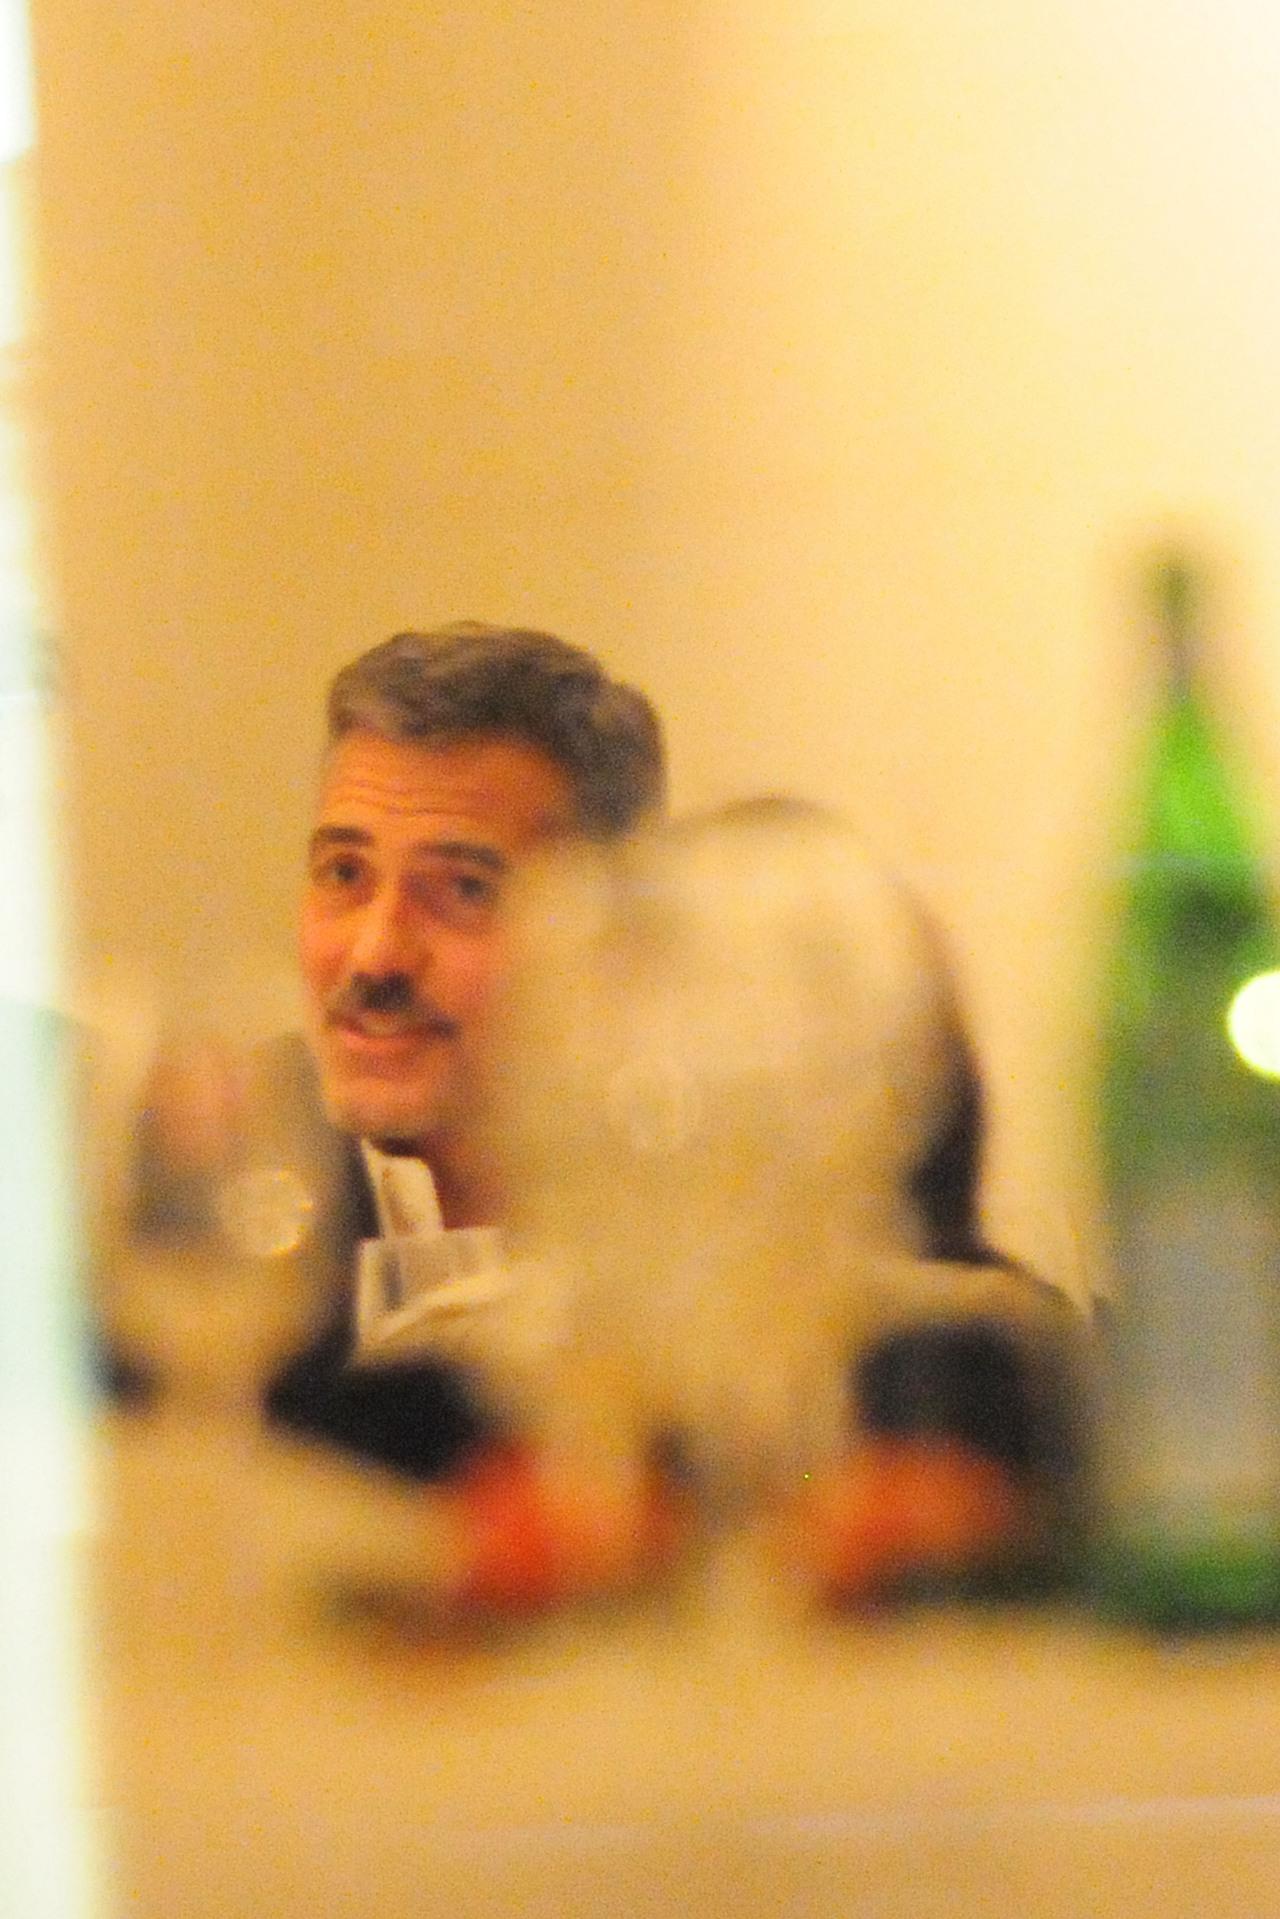 George Clooney George Clooney George Clooney! Tumblr_msfjpqNIFL1sblz9yo1_1280